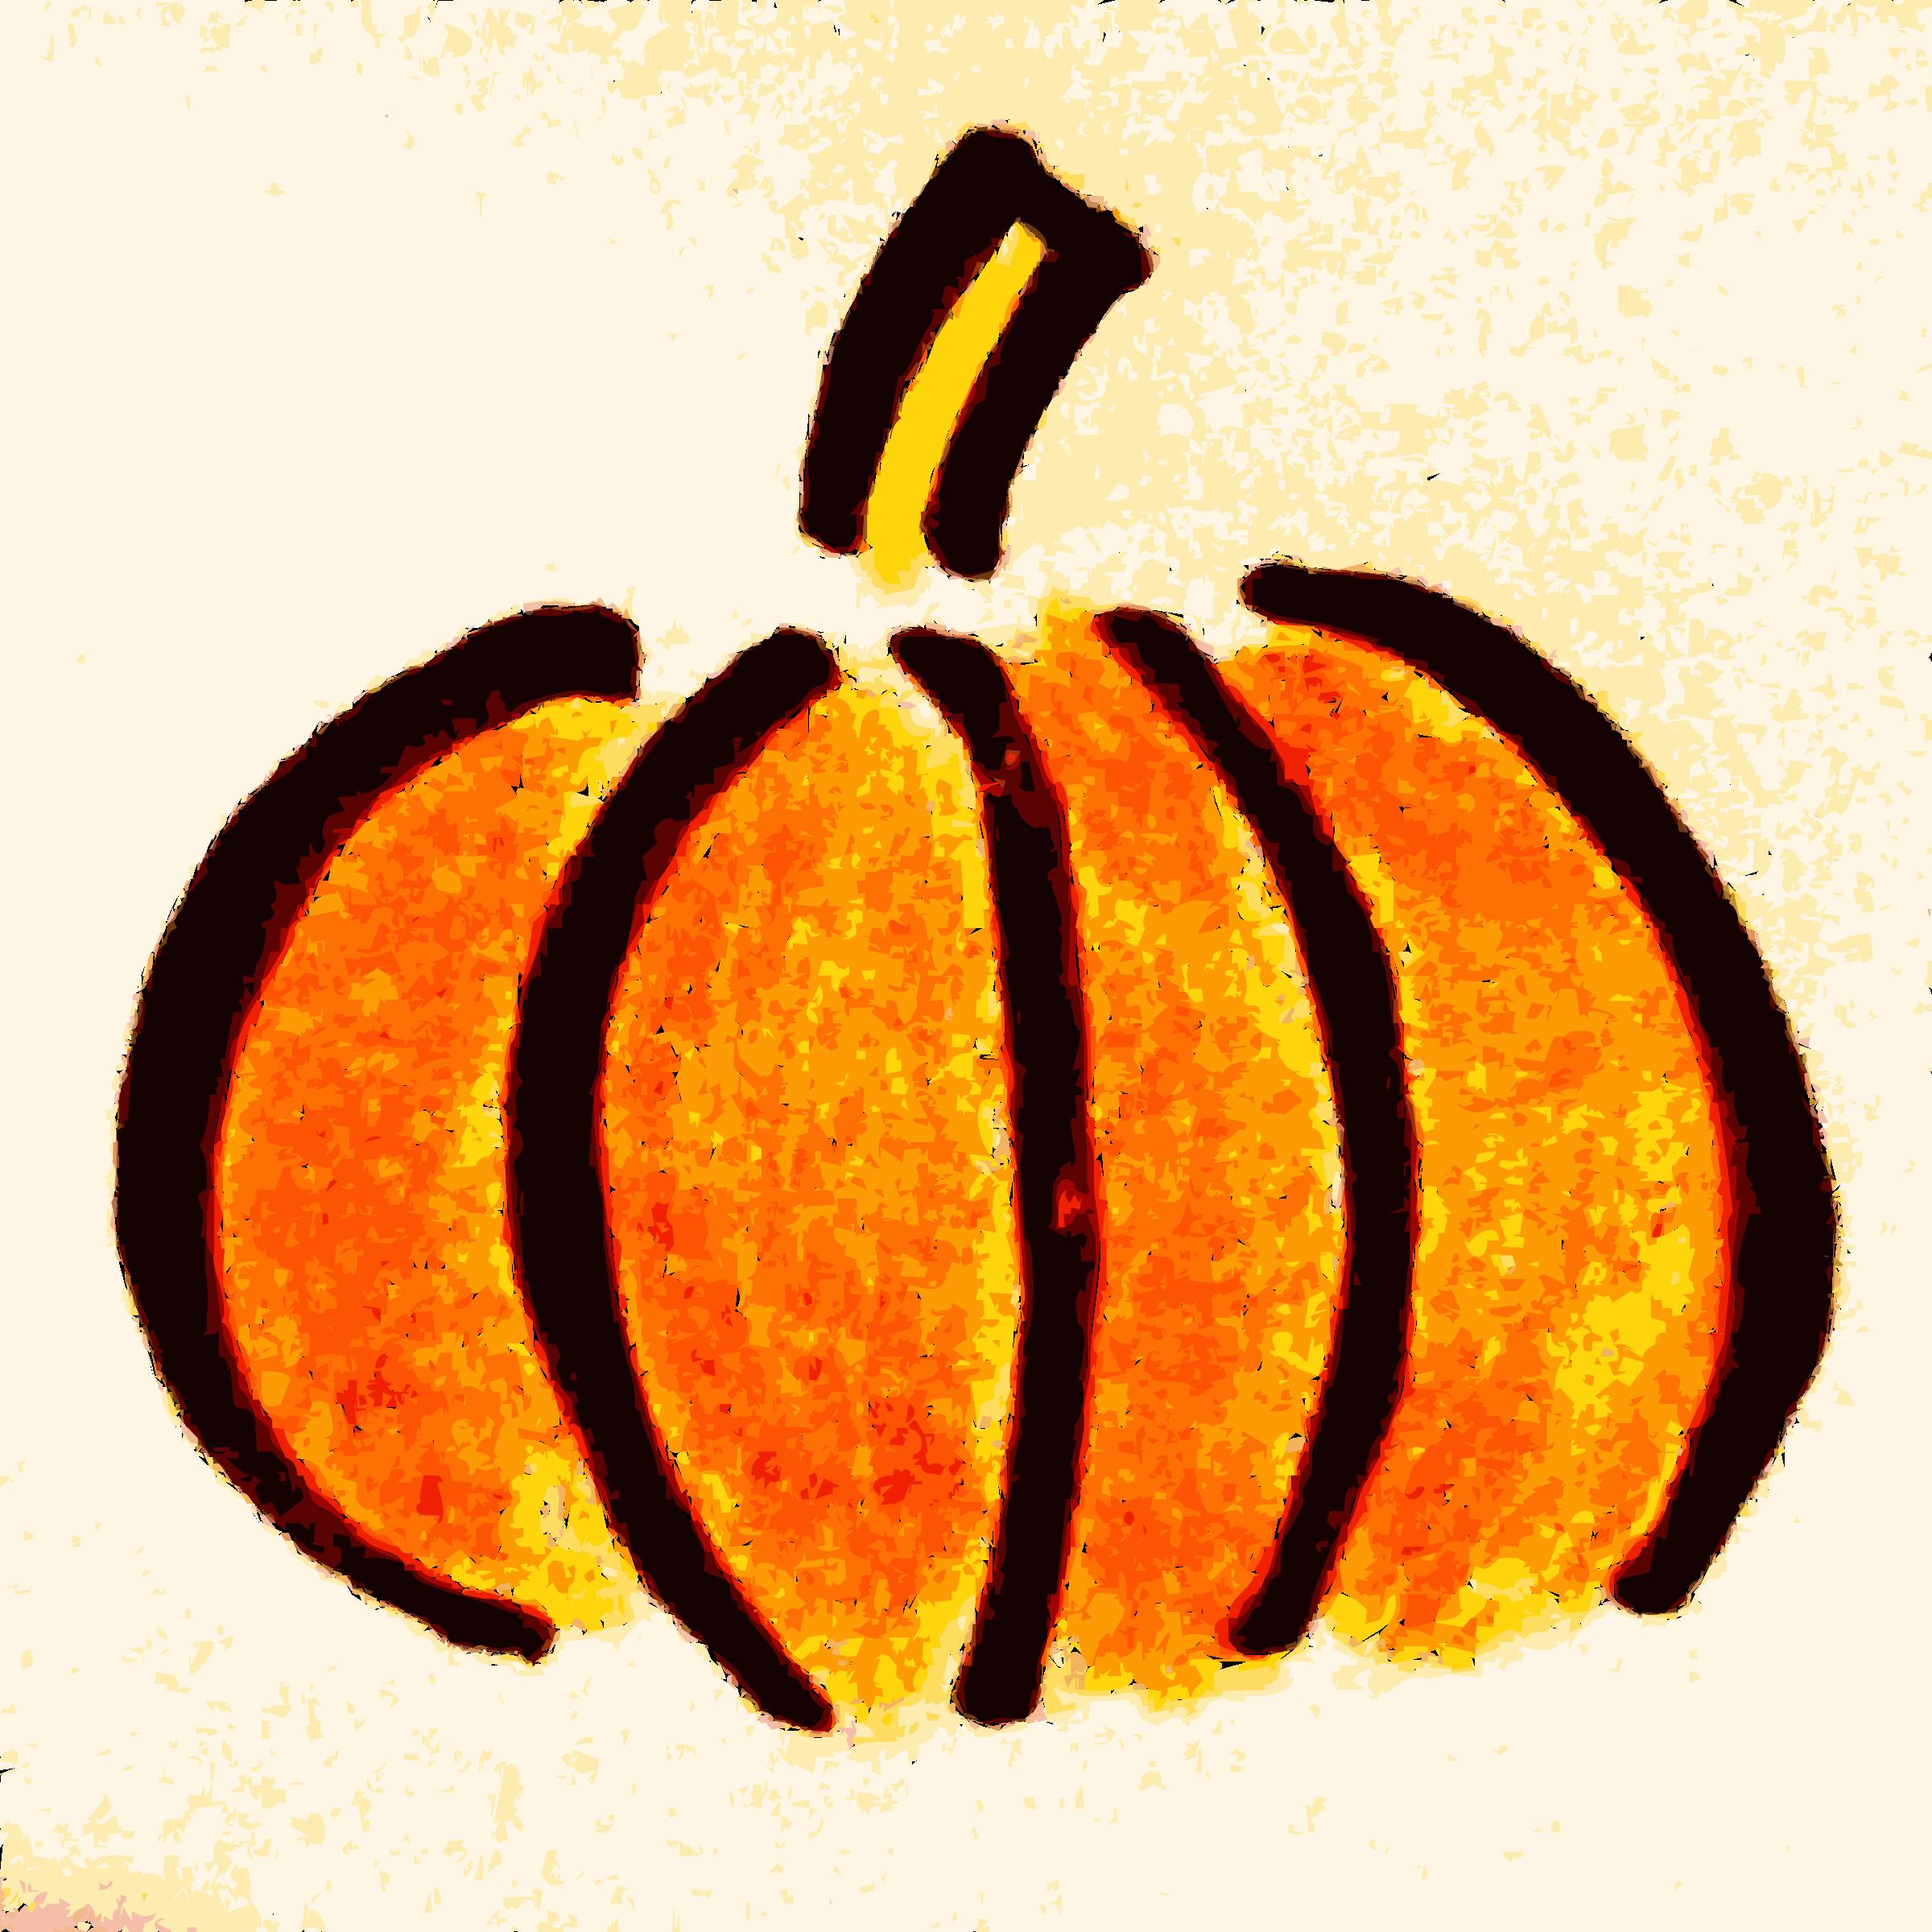 Drawn pumpkin Hand pumpkin drawn drawn pdclipart